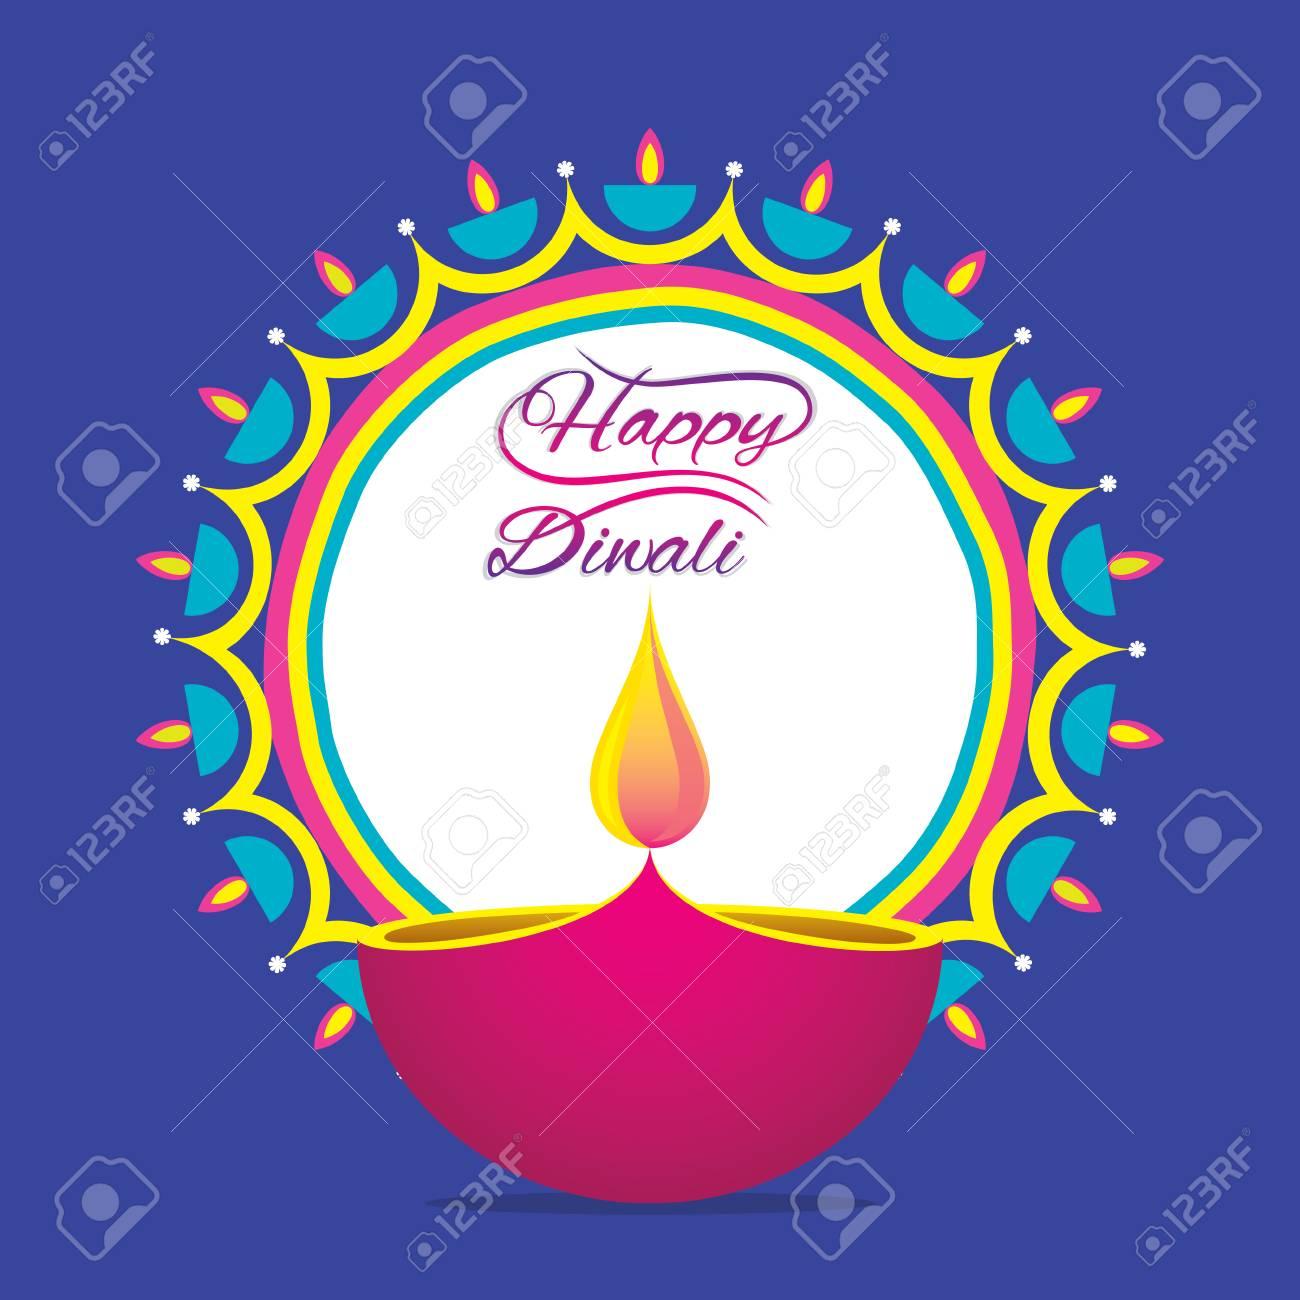 Creative Happy Diwali Greeting Design Diya Rangoli Royalty Free